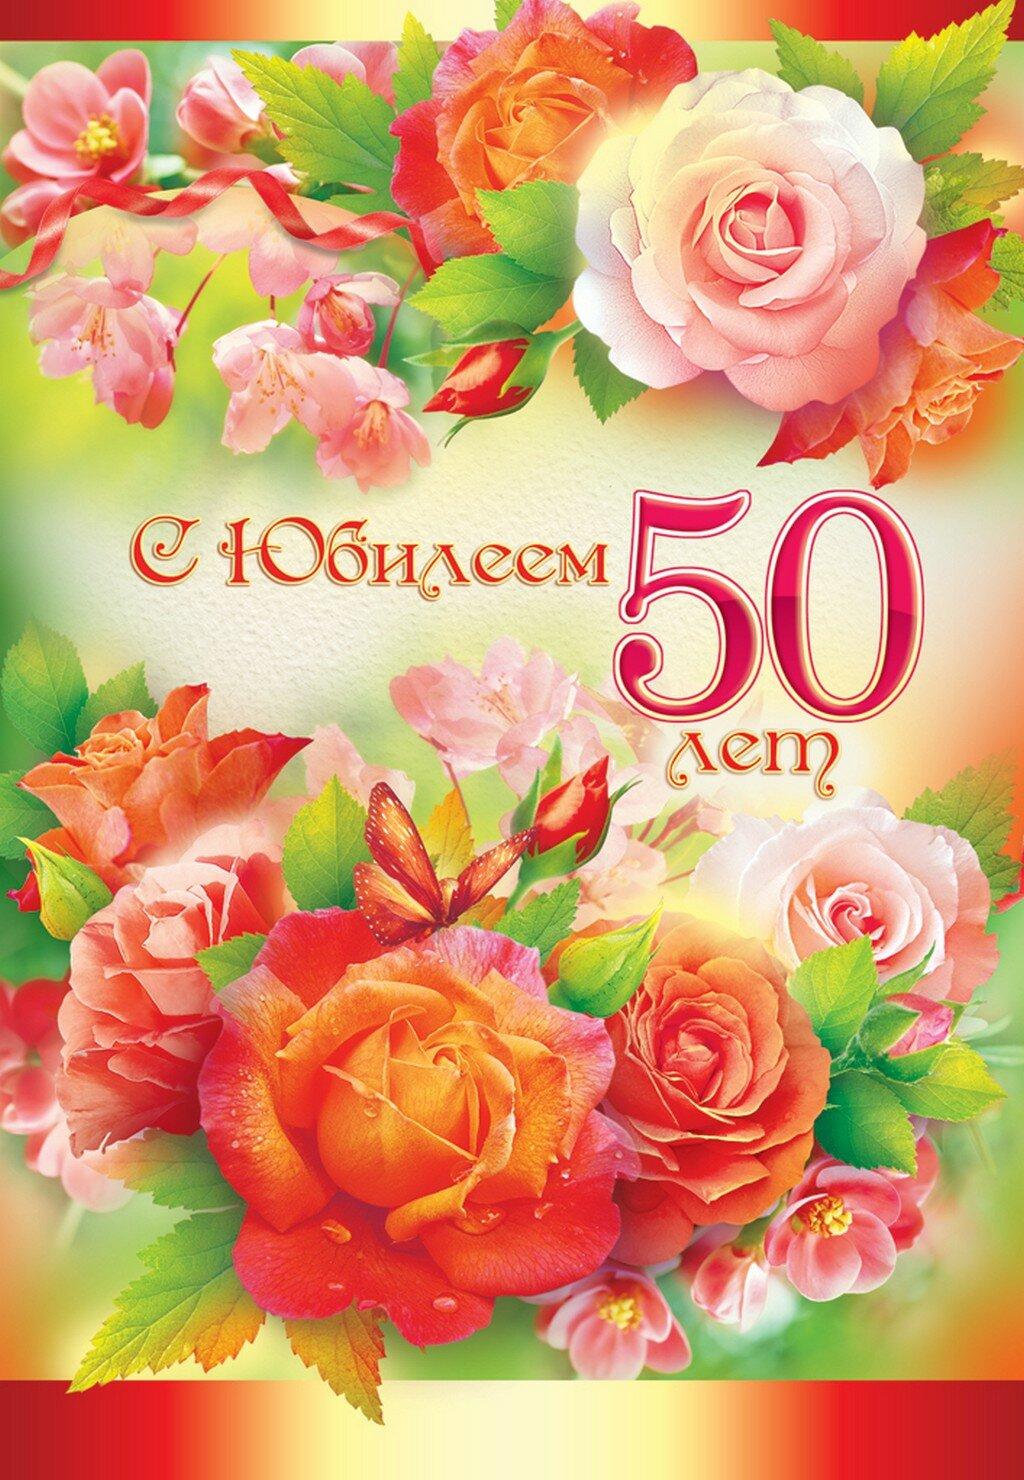 50 летний юбилей открытки